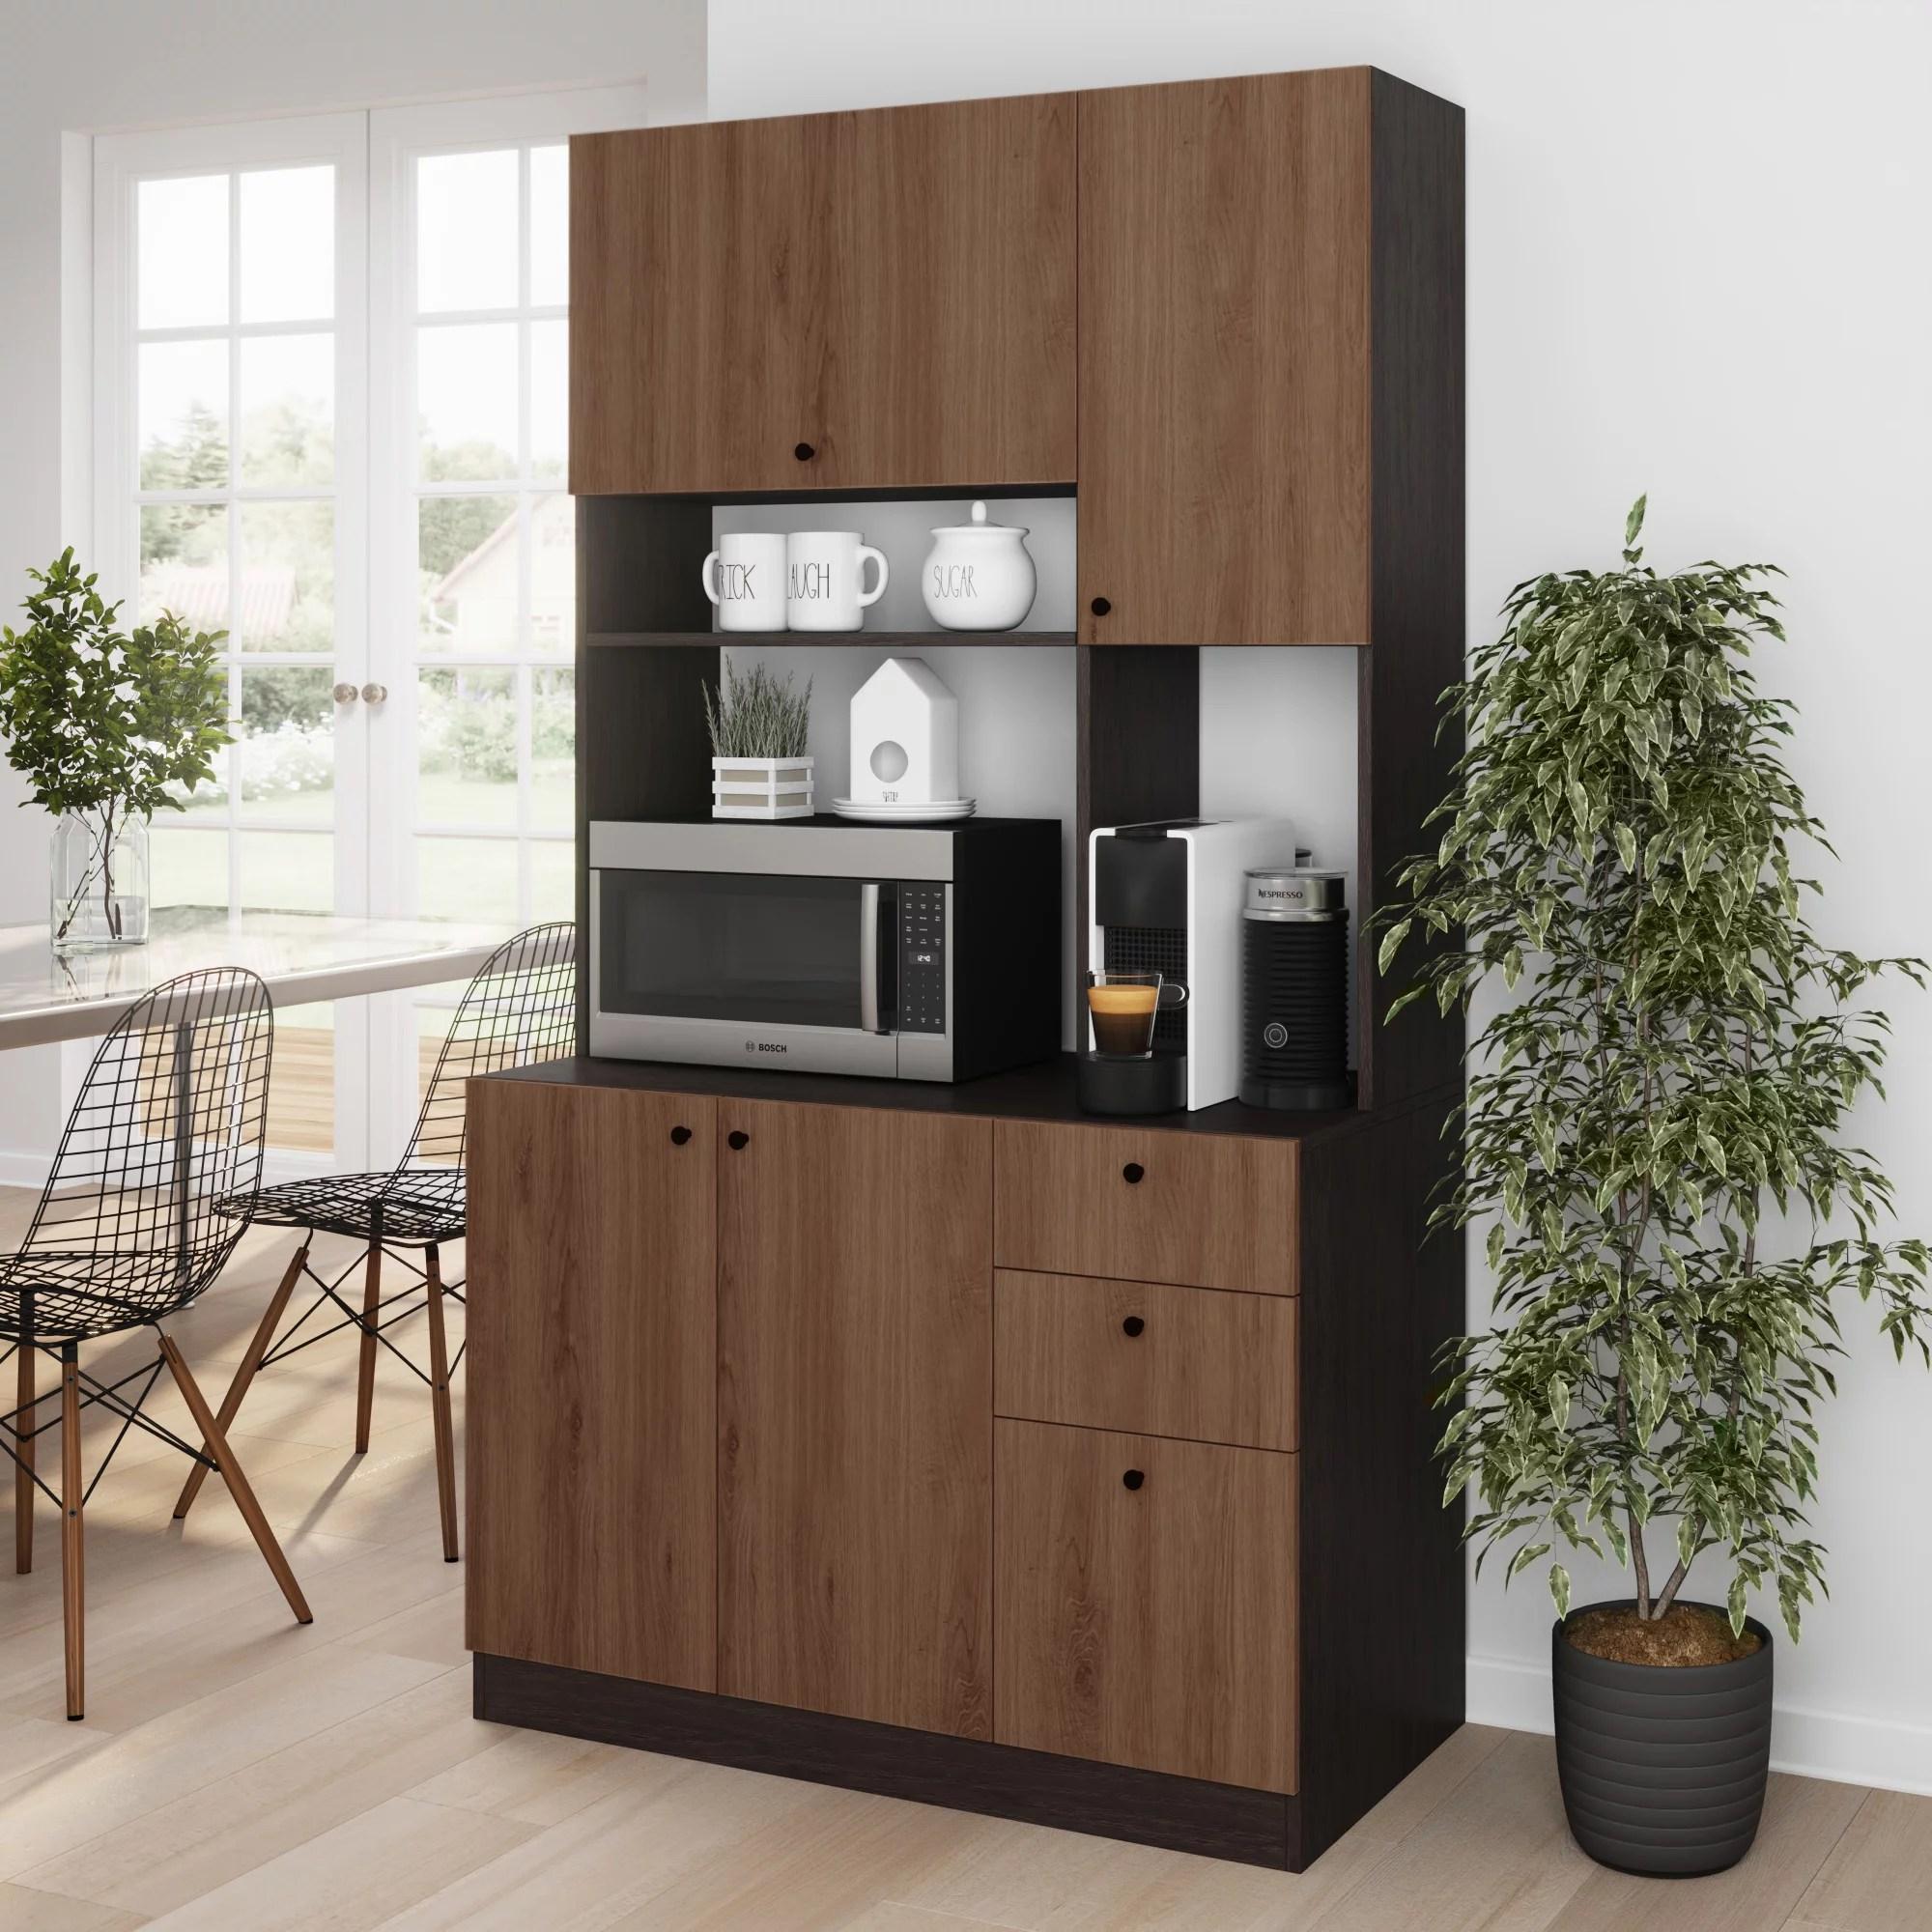 pantry cabinet kitchen china cabinet